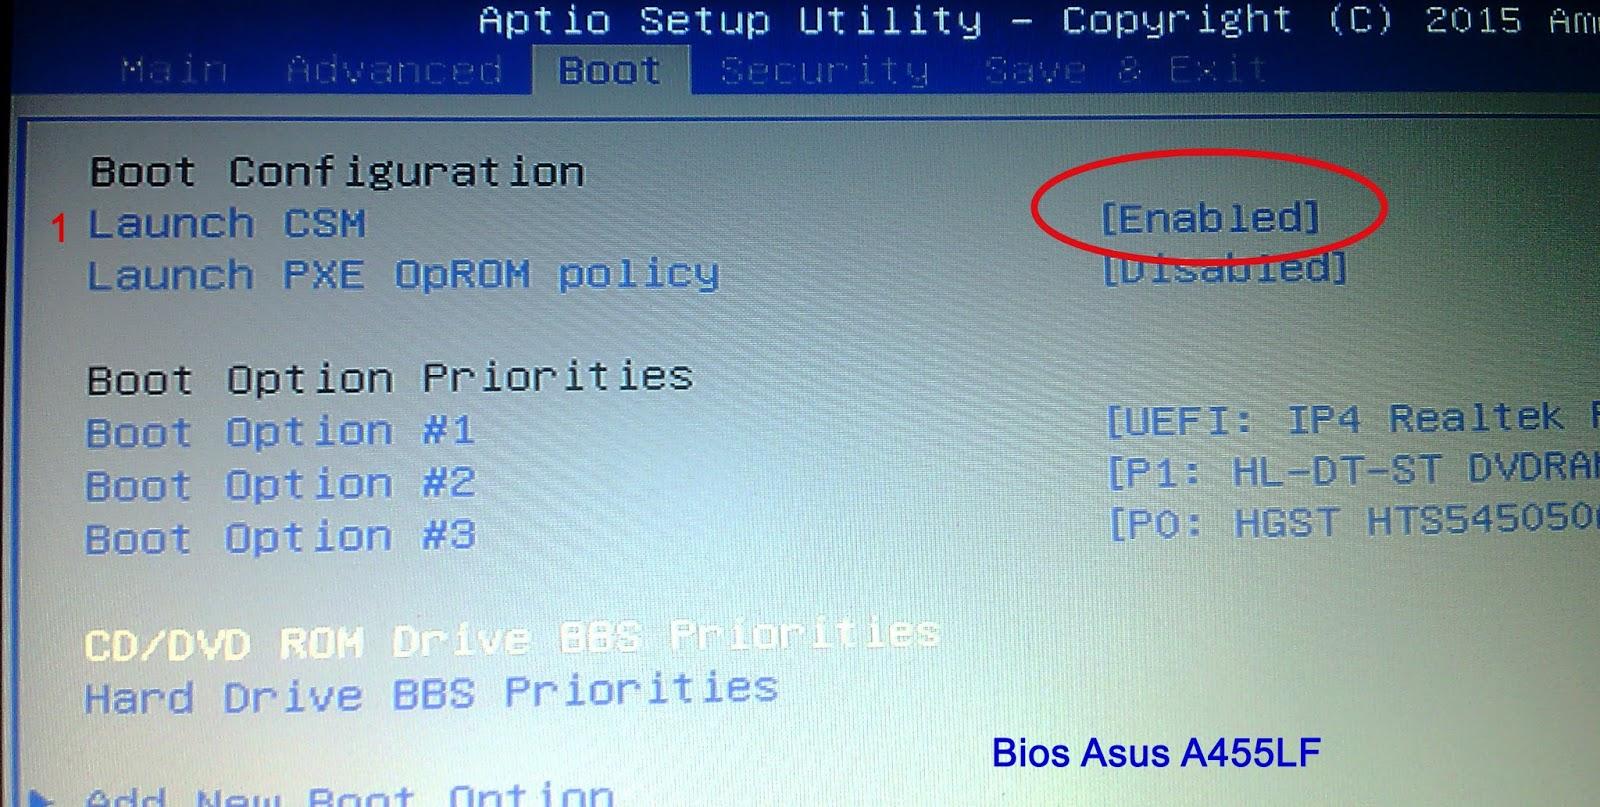 Install Windows 7 - 64bit di Asus A455L (BIOS UEFI) - Kijang Jantan